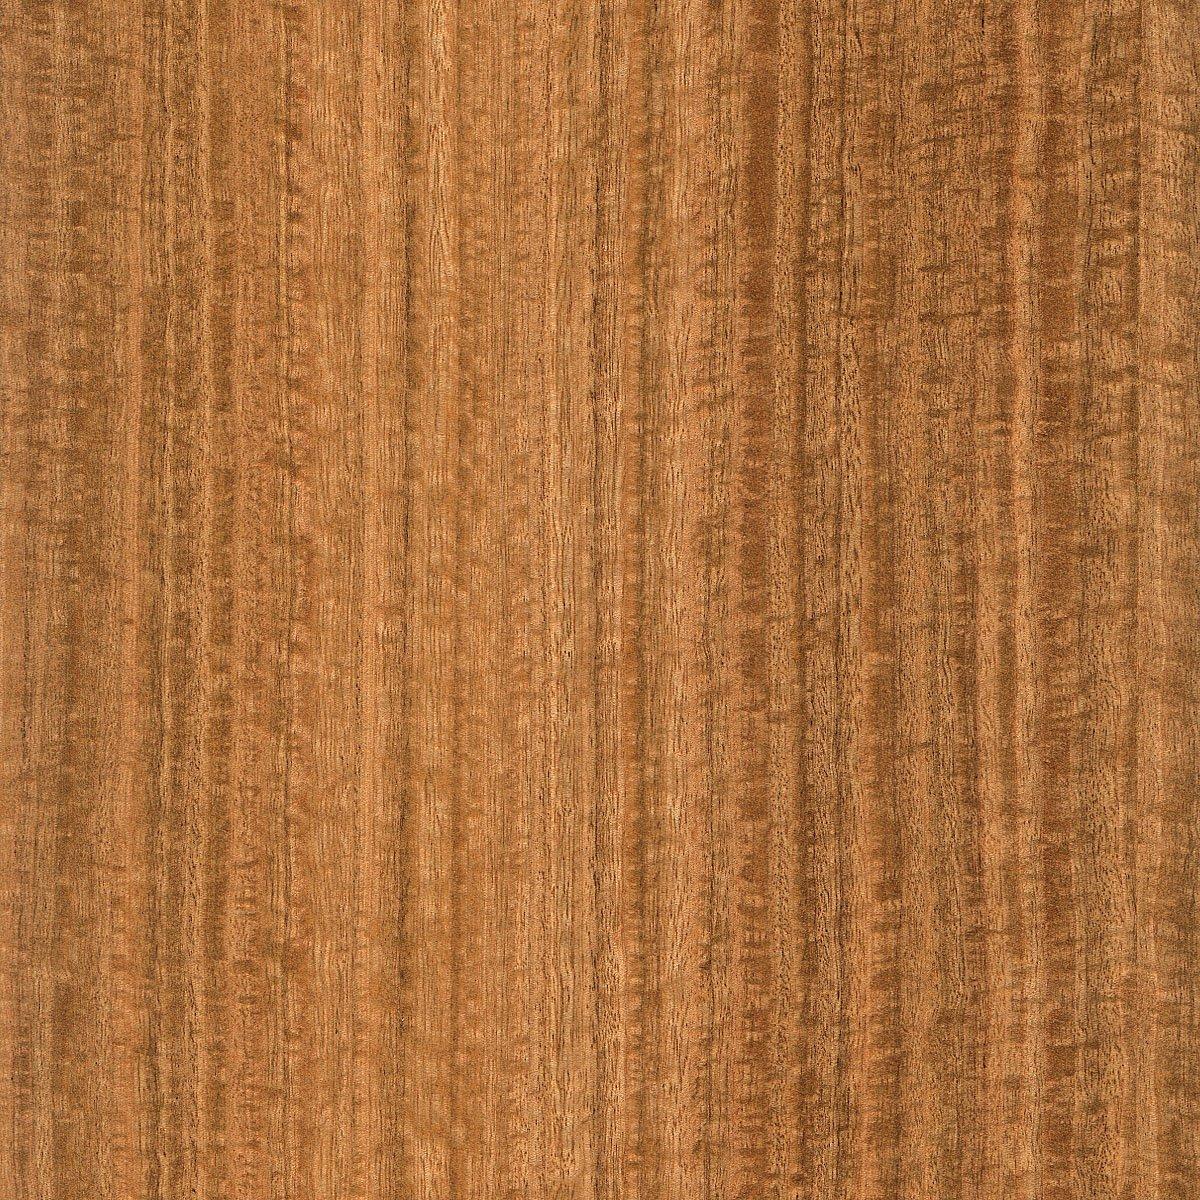 Eucalyptus Wood Veneer Qtr Cut Figured 4x8 10 mil Sheet